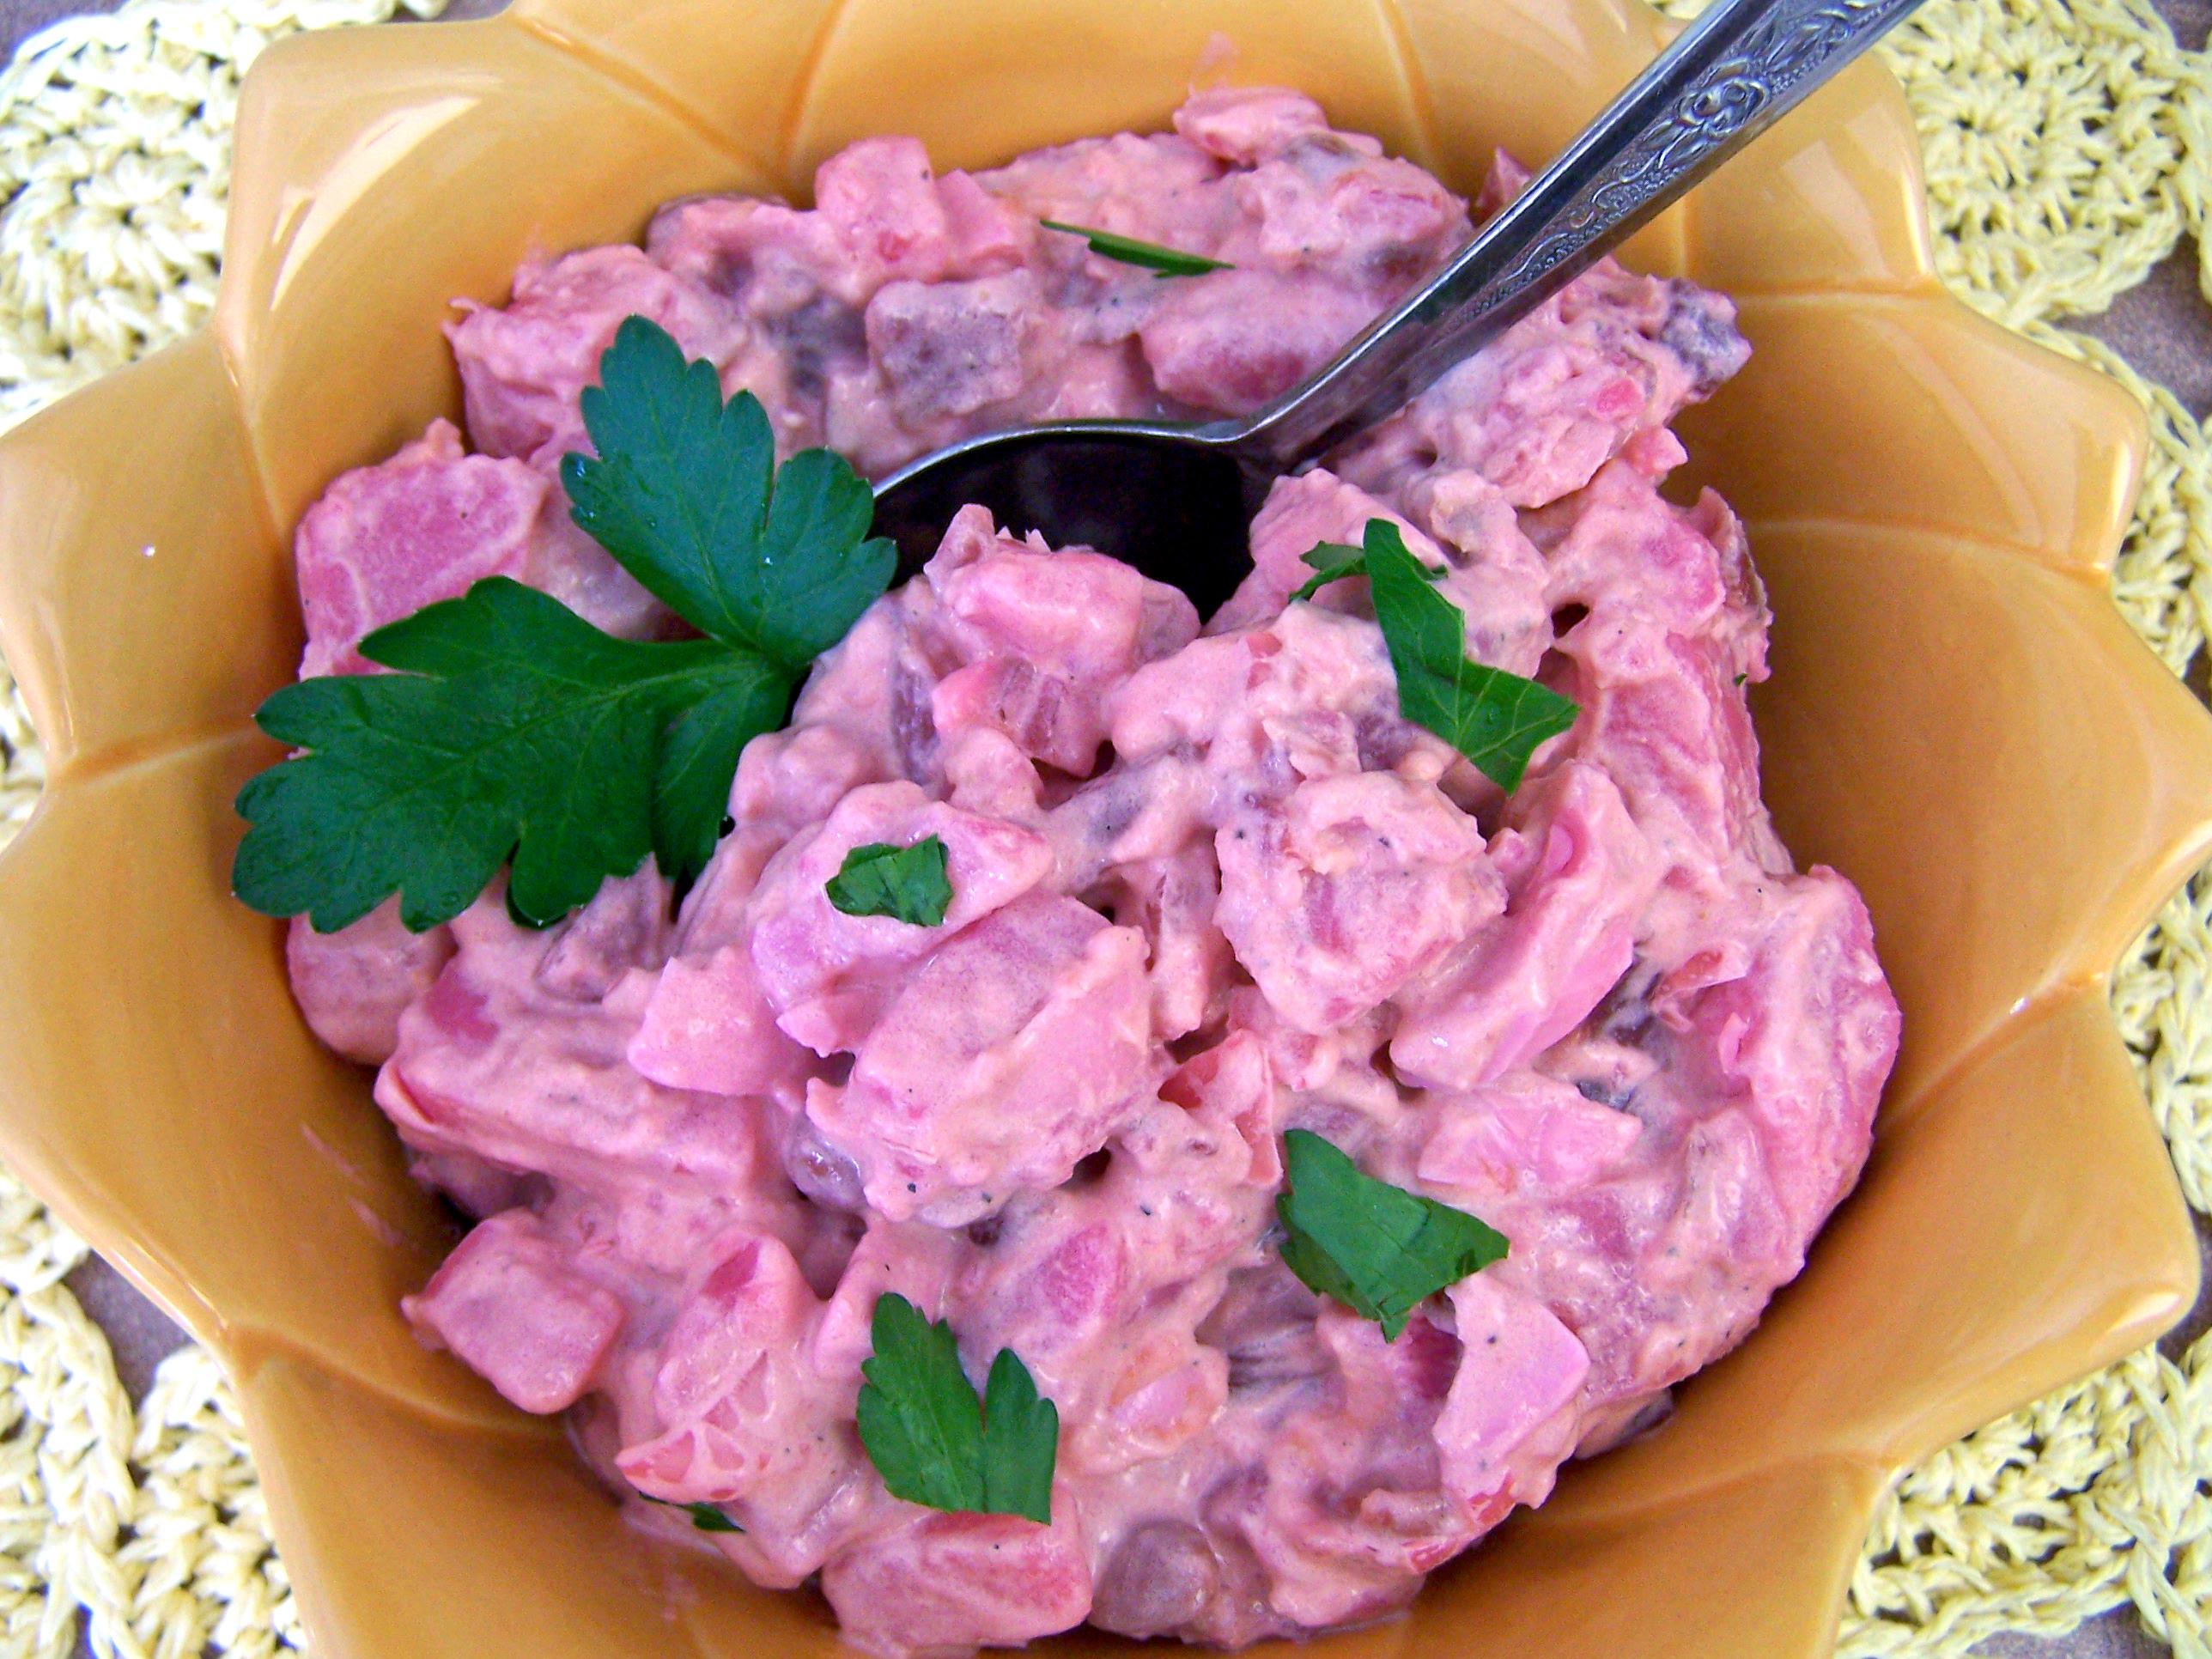 Potato and Beet Salad Recipe